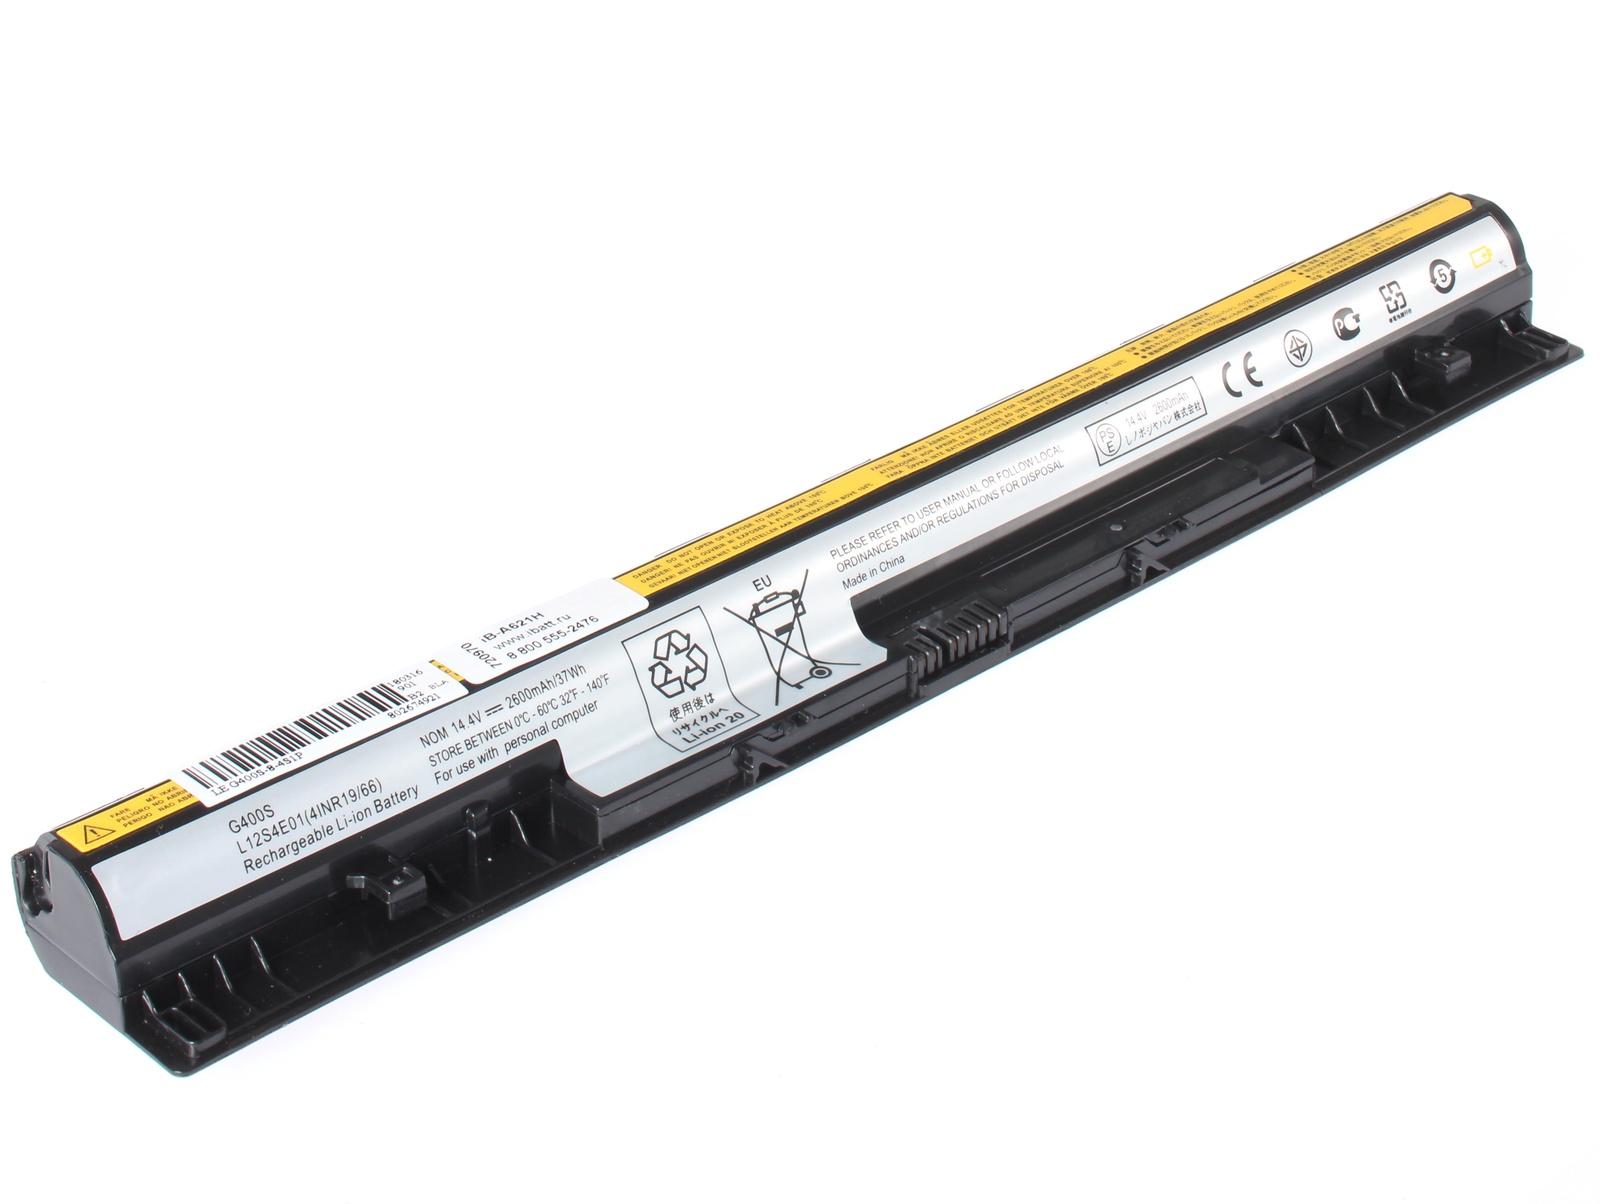 Аккумуляторная батарея iBatt iB-T1-A621H 2600mAh для ноутбуков iBM-Lenovo для G50-30, G50-45, G50-70, G50-80, IdeaPad Z710, IdeaPad S510p, IdeaPad G500S, IdeaPad G505s, G40-45, G40-70, G505s Series, IdeaPad Z710 59396874, G50-70M, IdeaPad Z710 59391654, 6 cell 11 1v 5200mah новый замена аккумулятор для ноутбука lenovo ideapad y460 ideapad y560